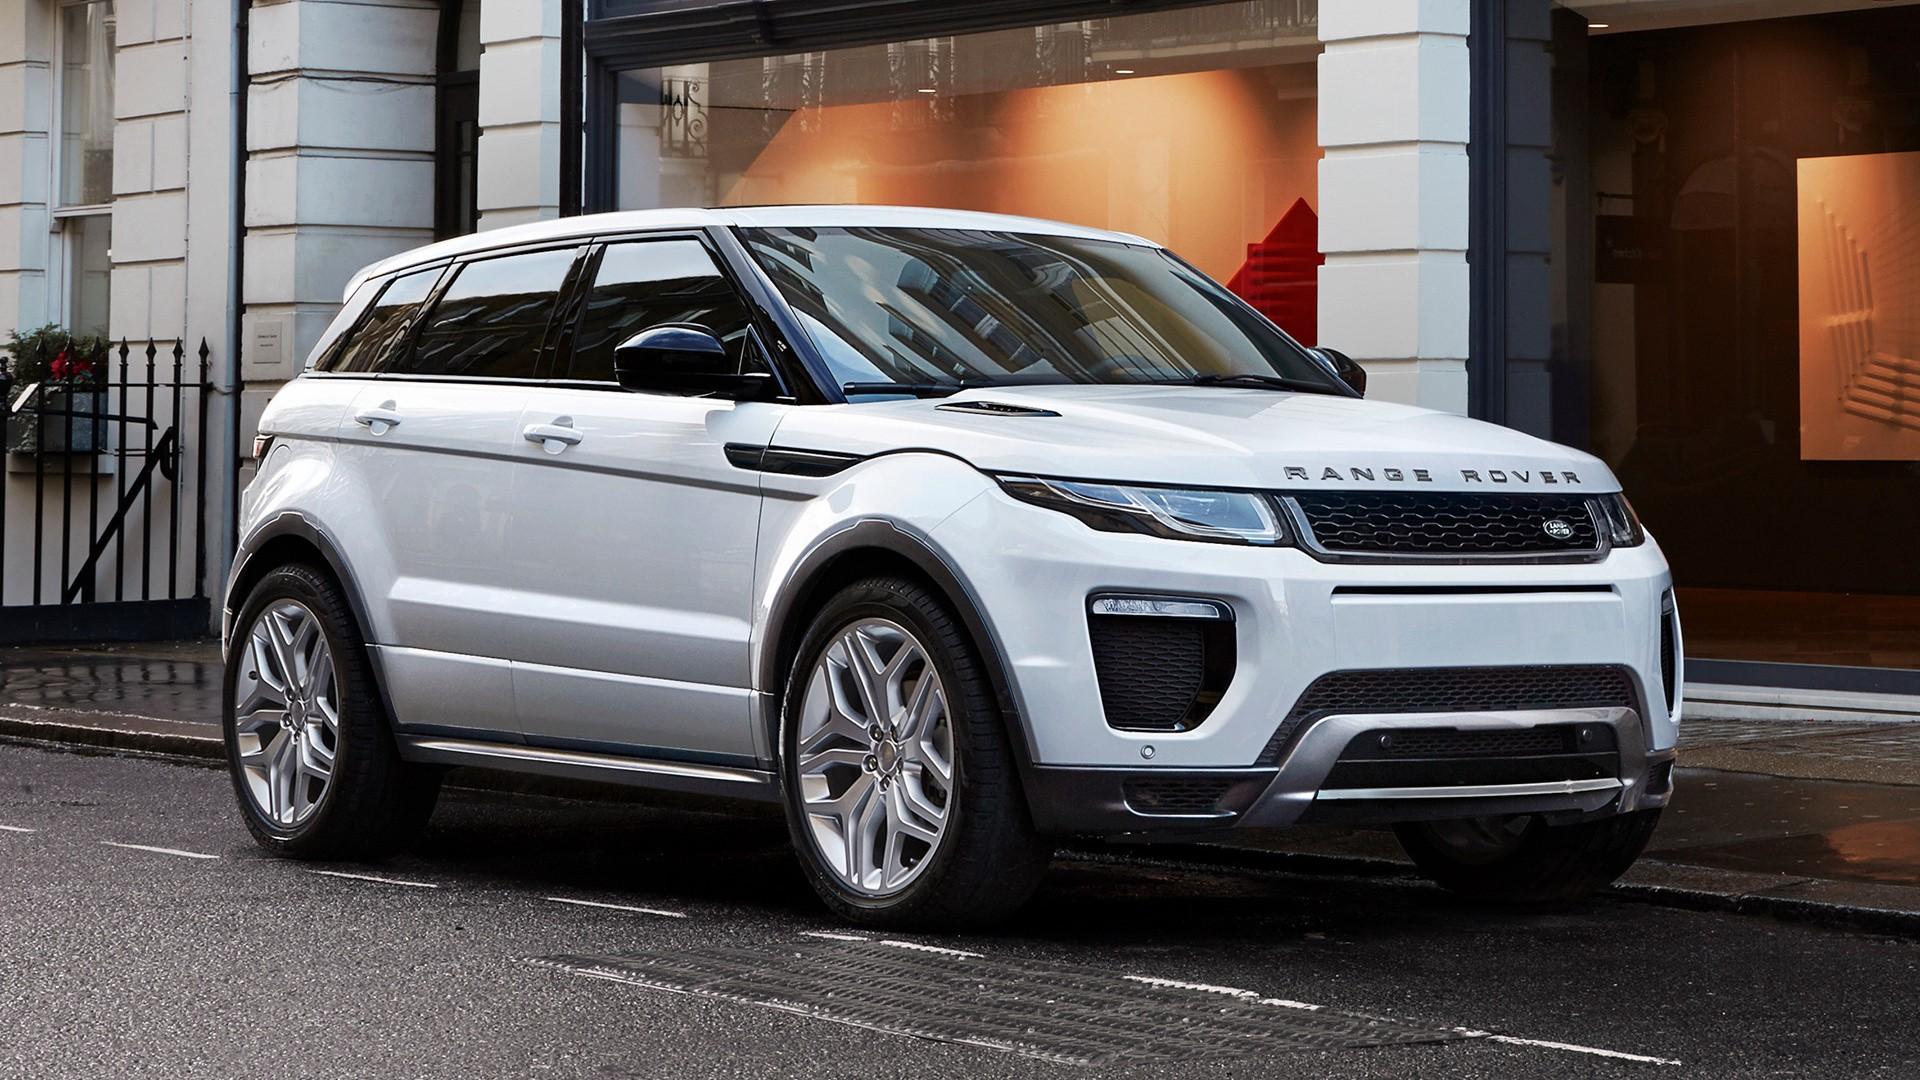 Range Rover Evoque иSport вРФ можно купить попрограмме trade-in